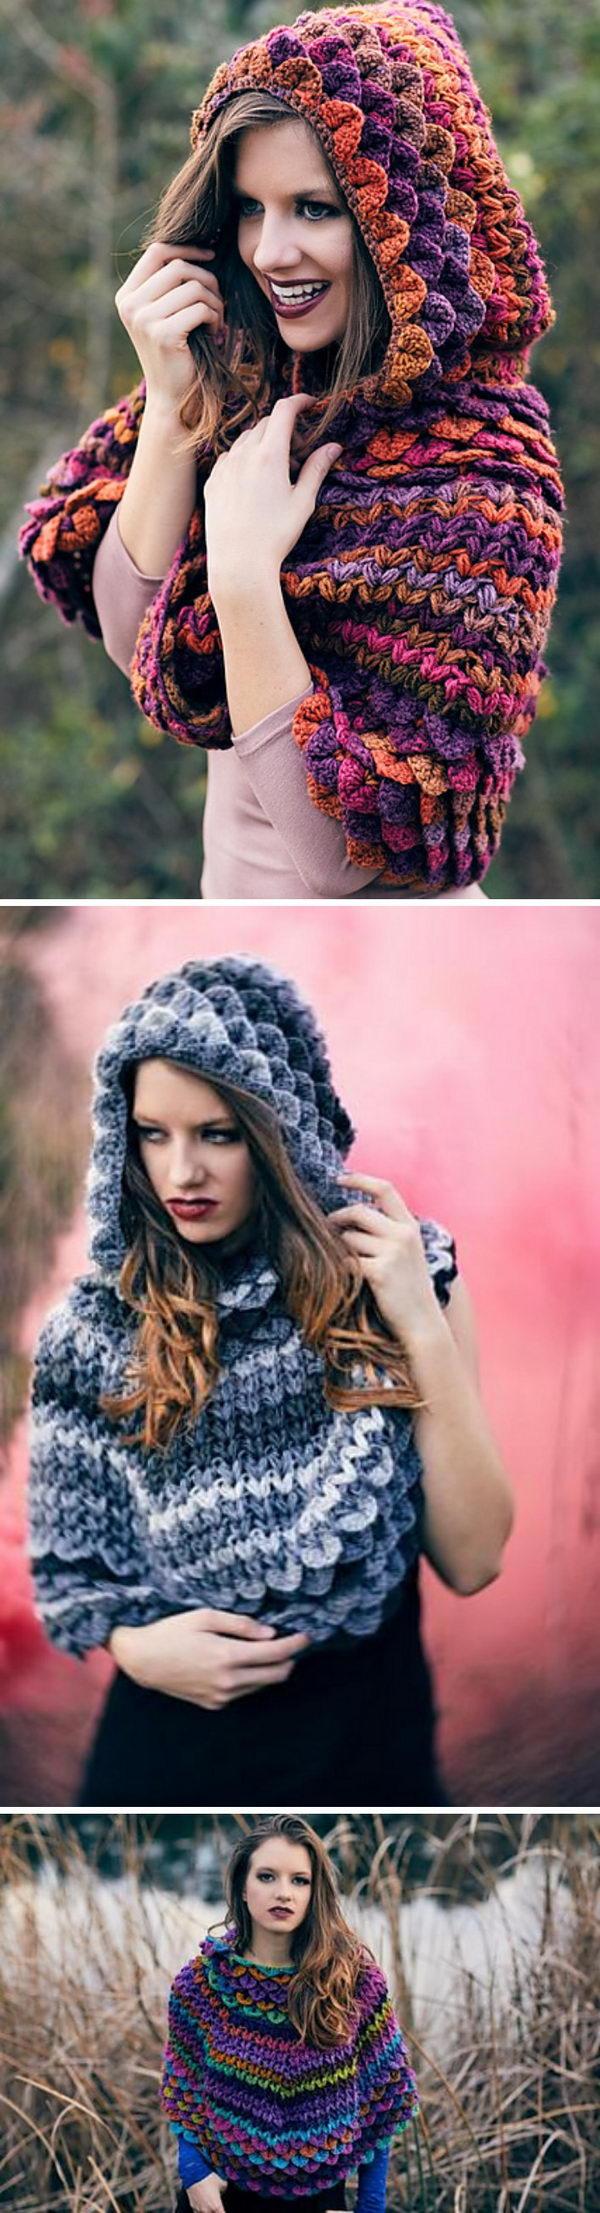 20 crochet women capes poncho ideas - 20 Crochet Women Capes and Poncho Ideas